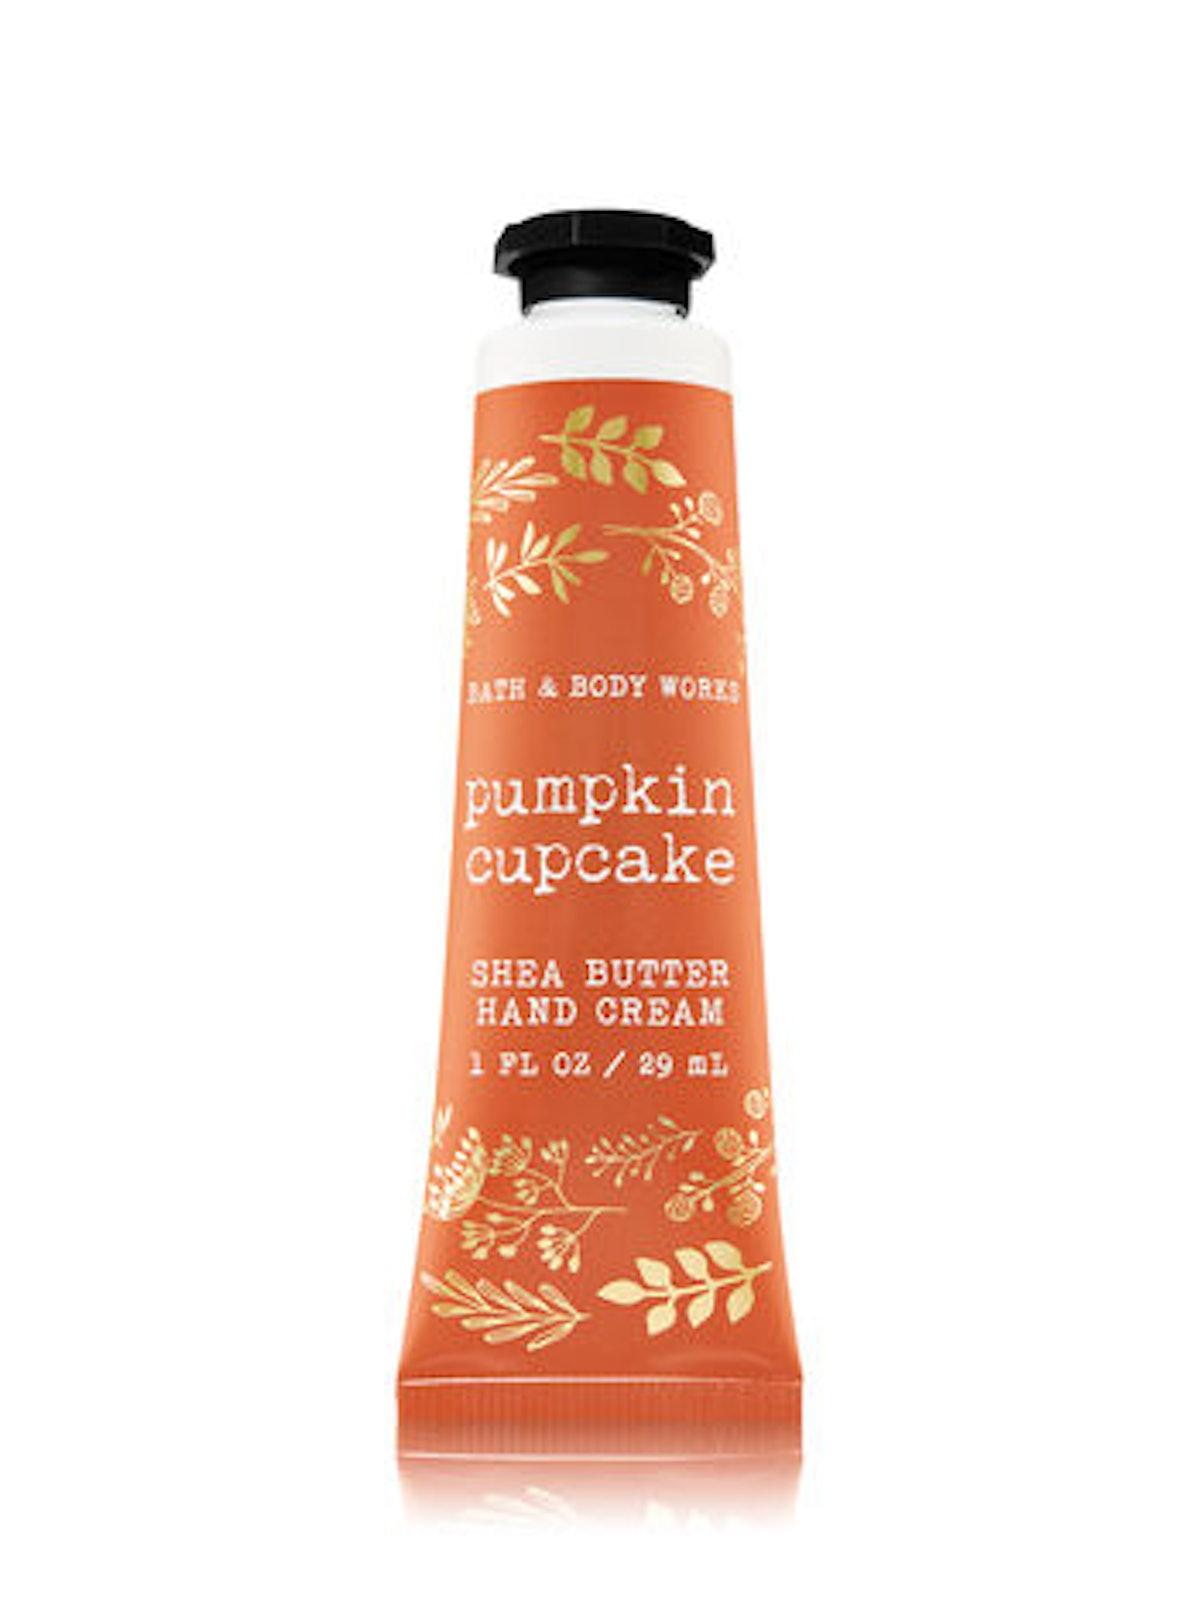 Pumpkin Cupcake Hand Cream